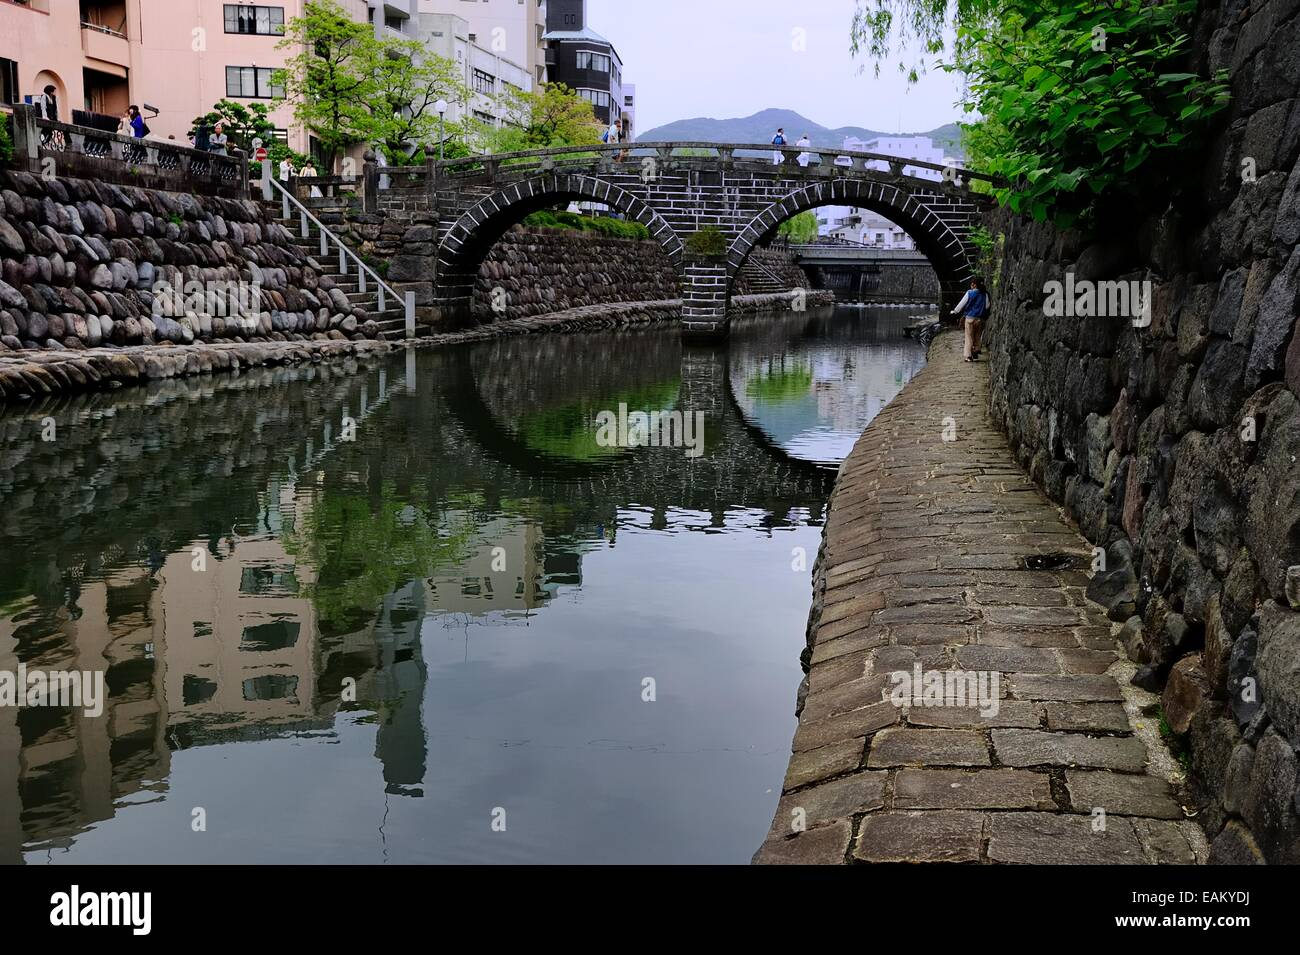 Spectacle Bridge, Nagasaki - Stock Image